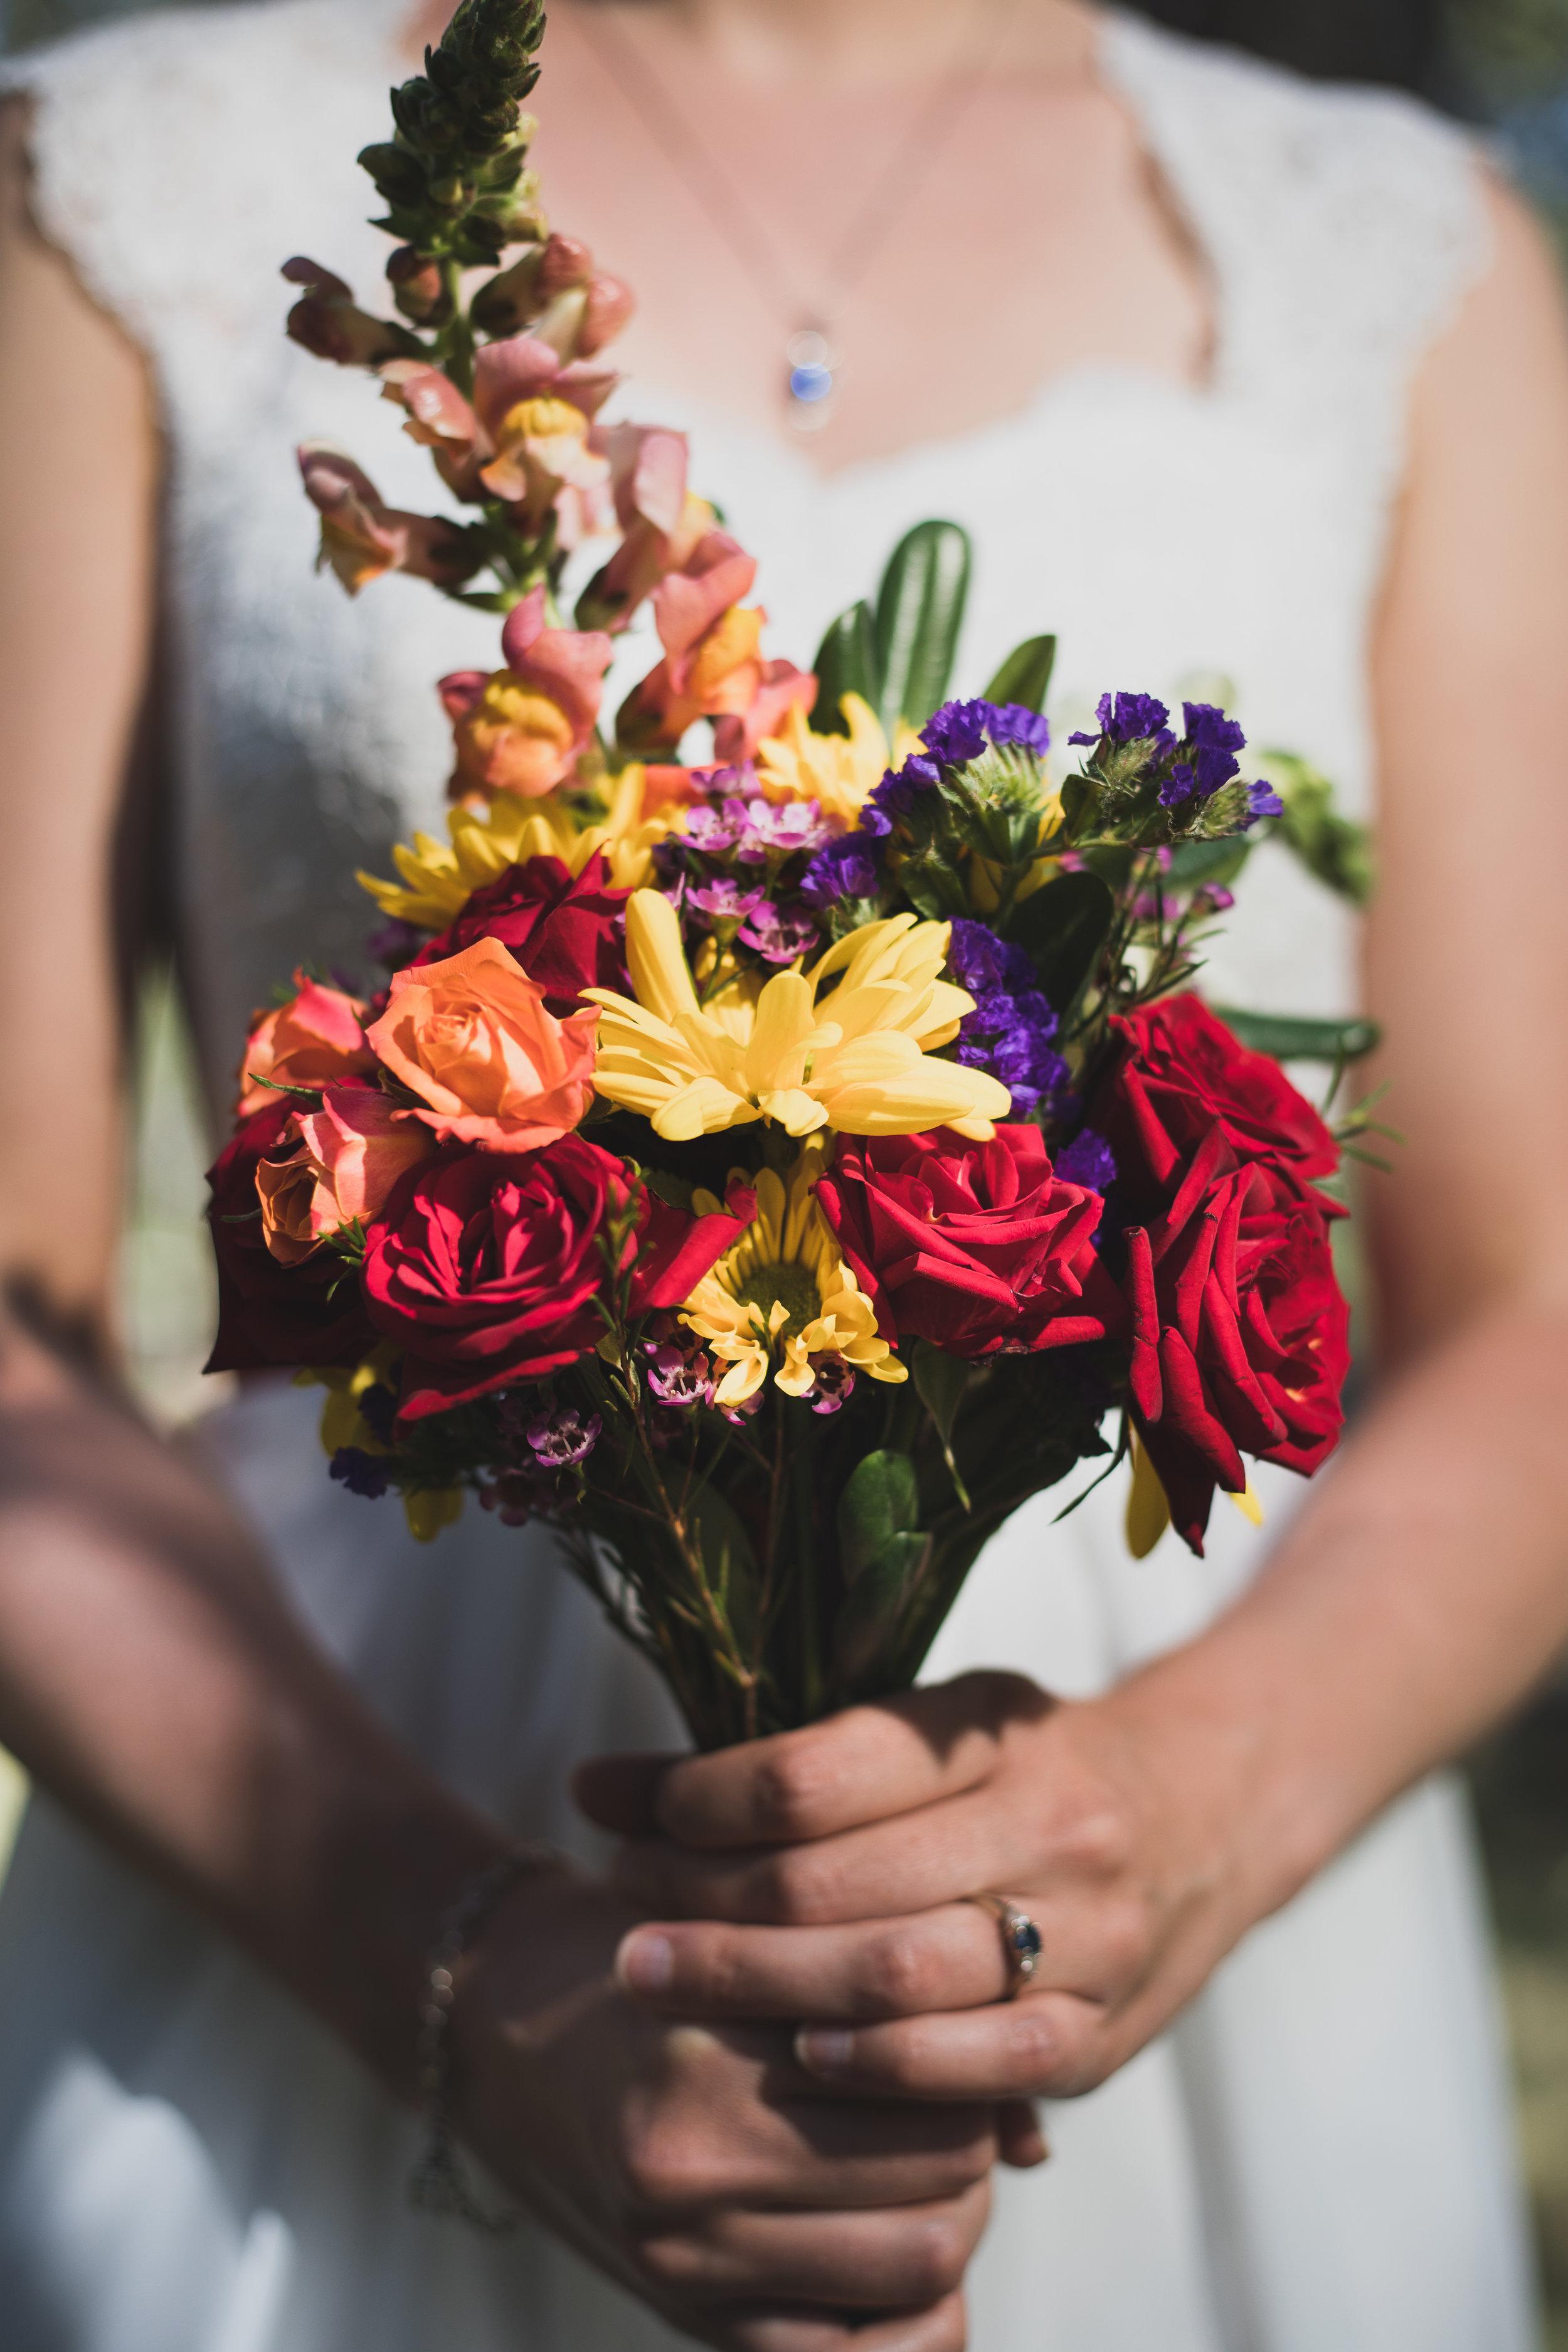 flagstaff-nordic-center-wedding-15.jpg